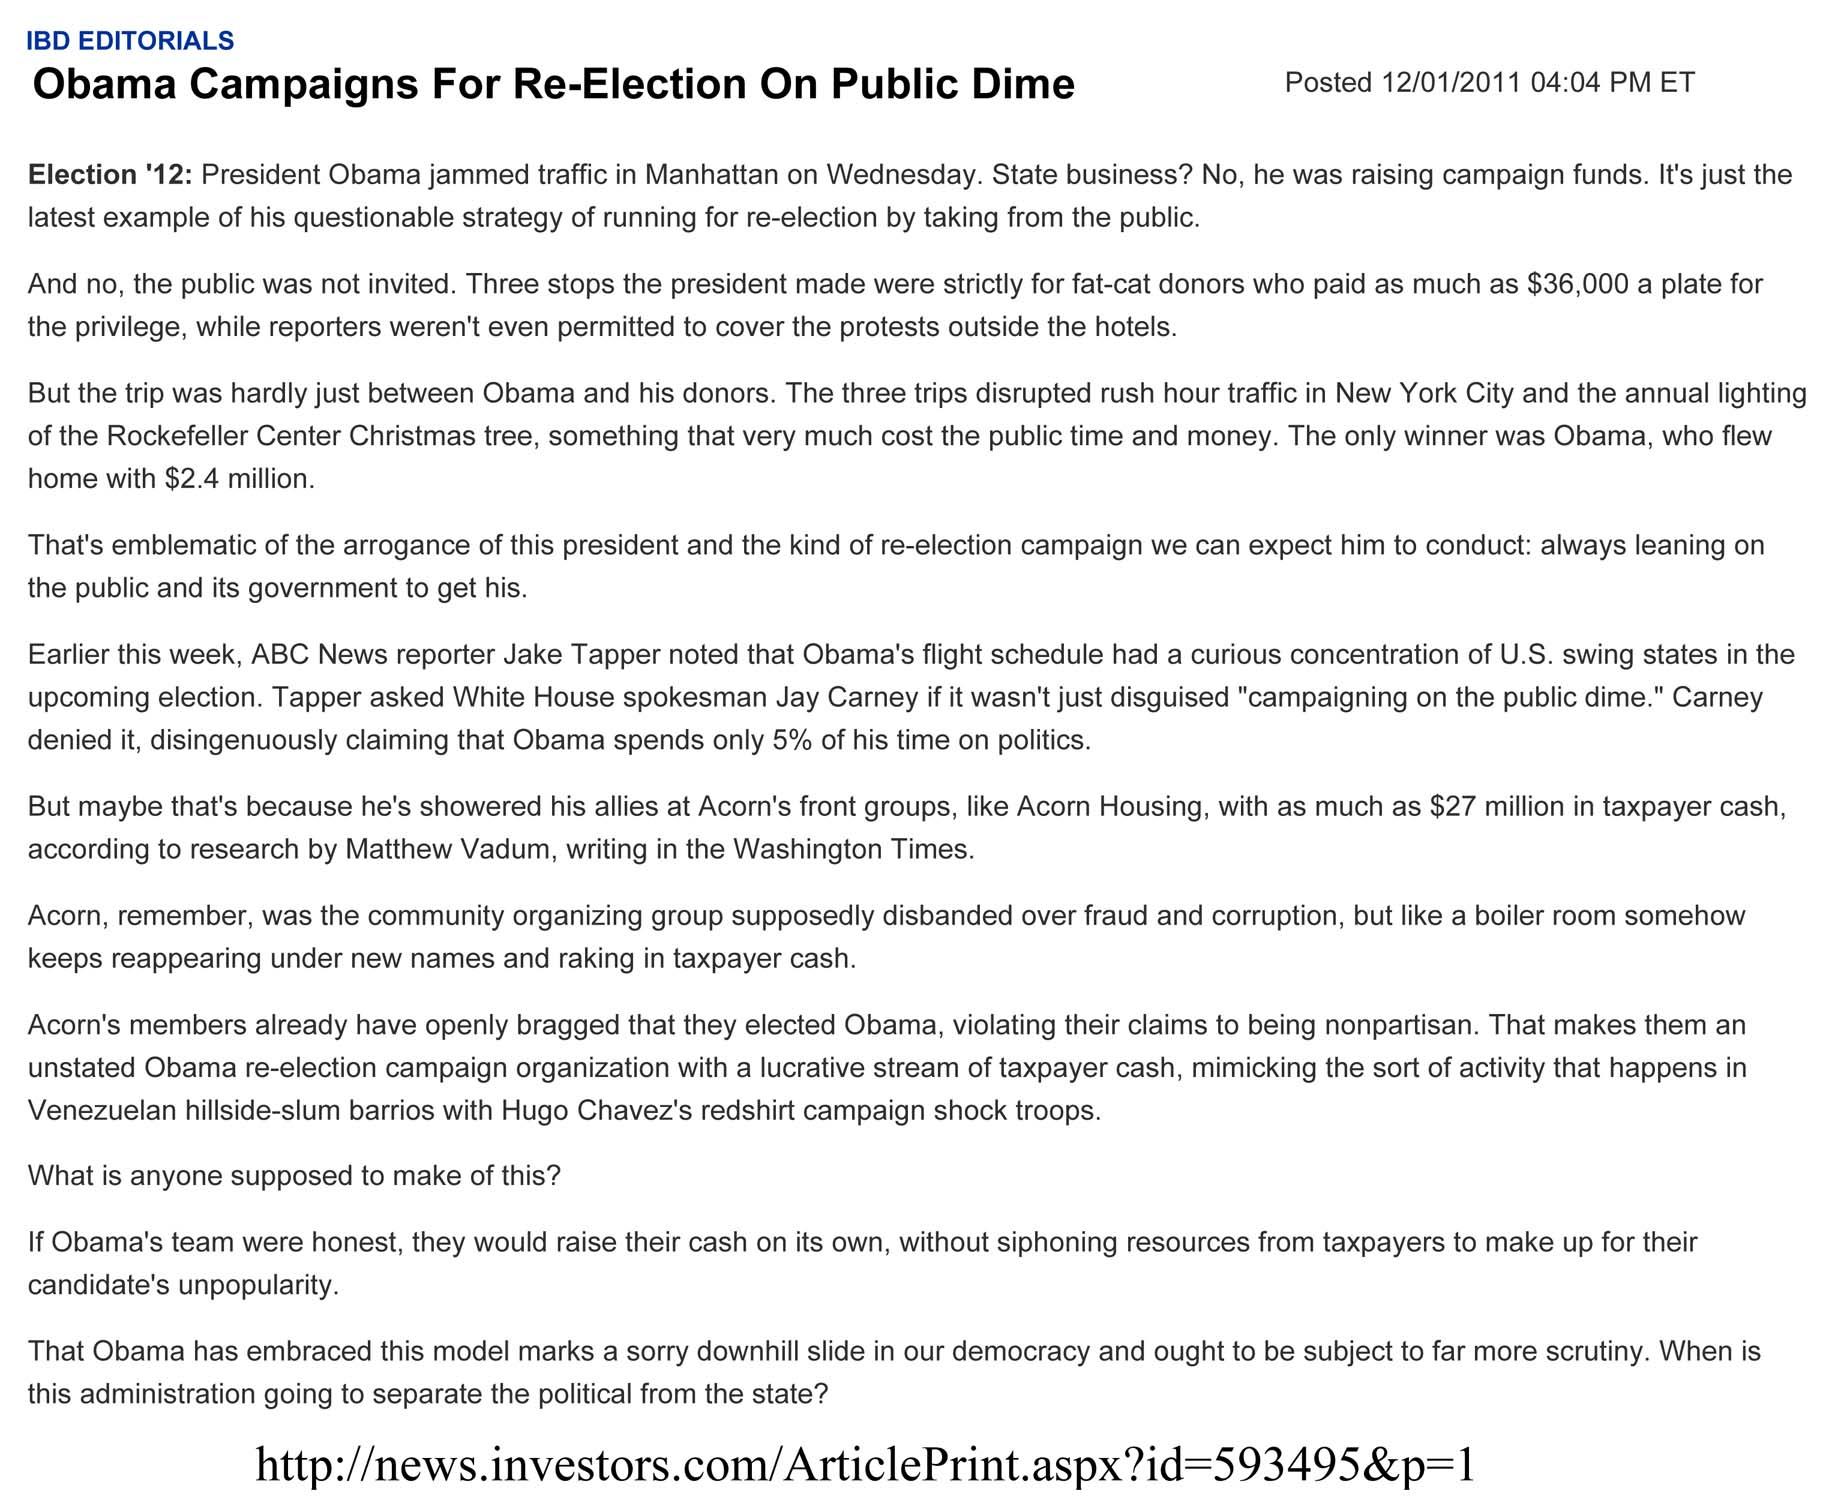 On The Public Dime